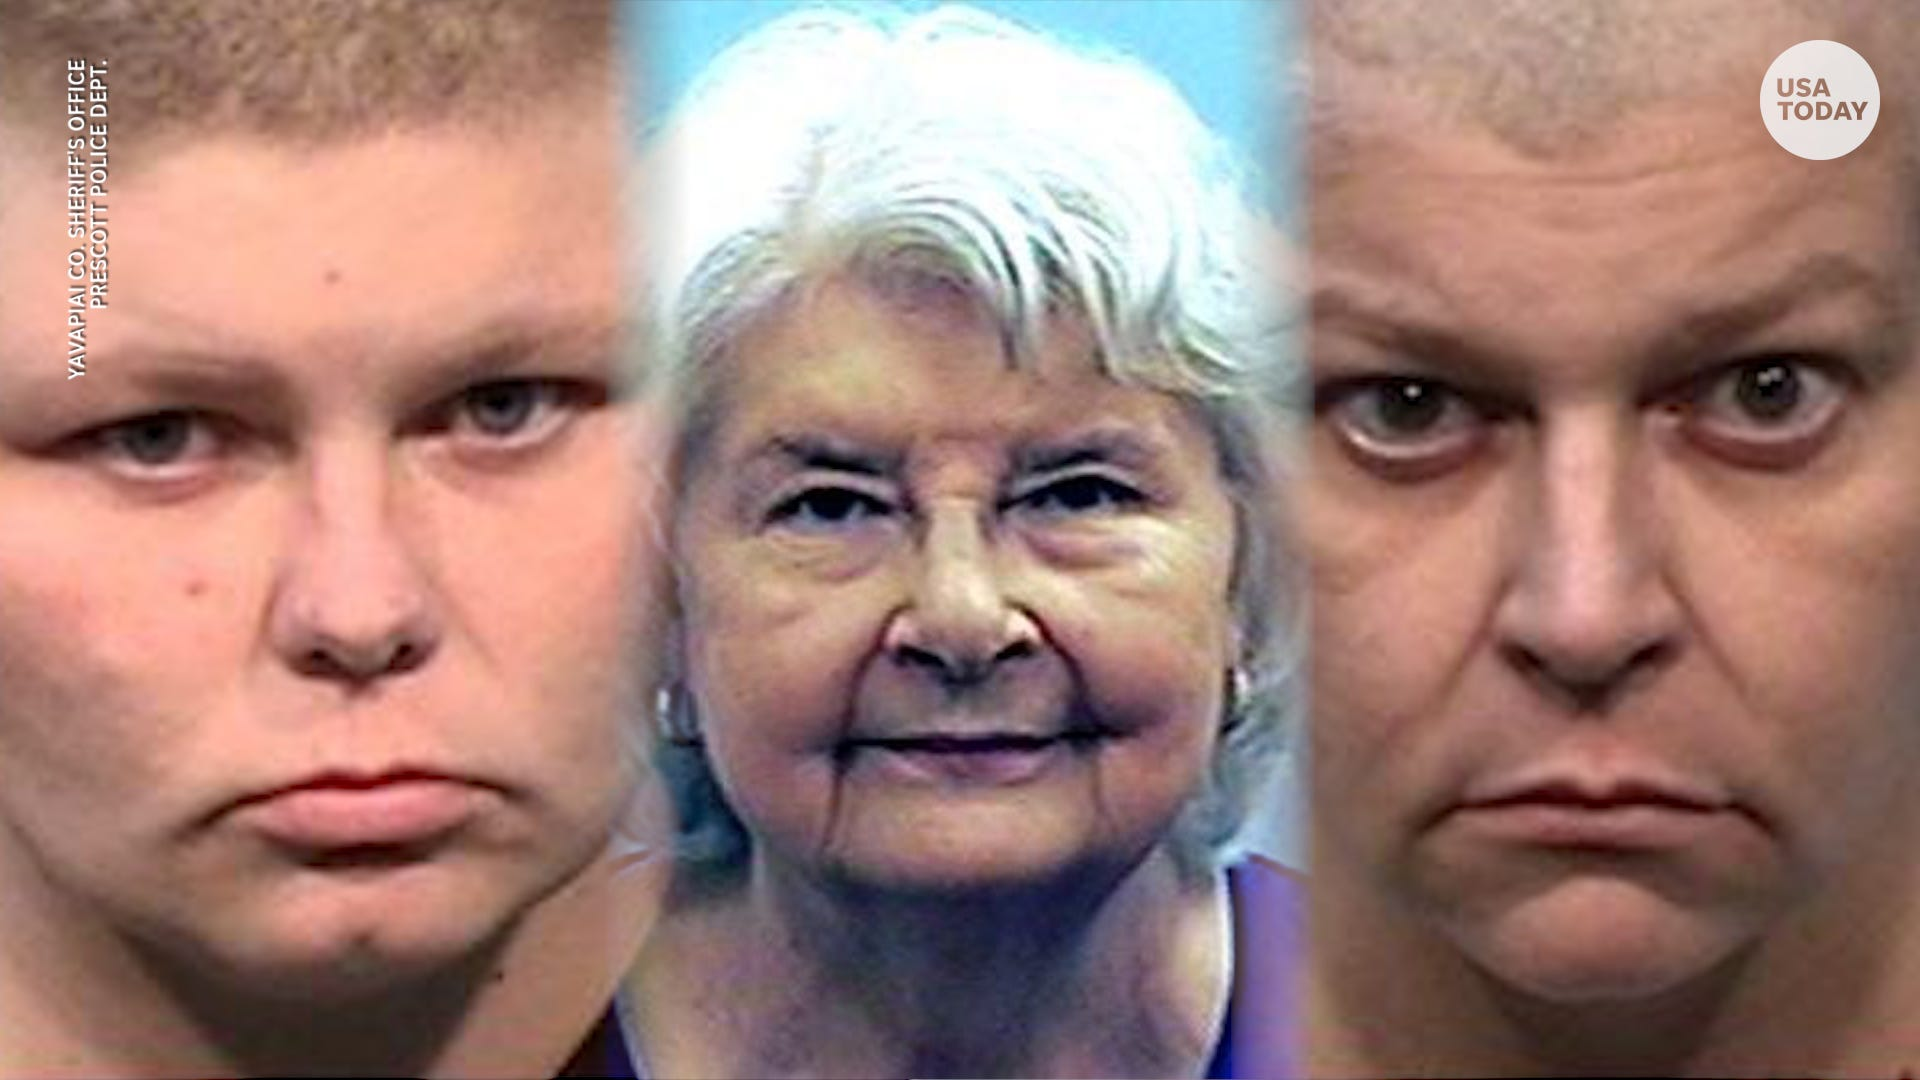 Mom, daughter confess to grandma's murder, cashing checks